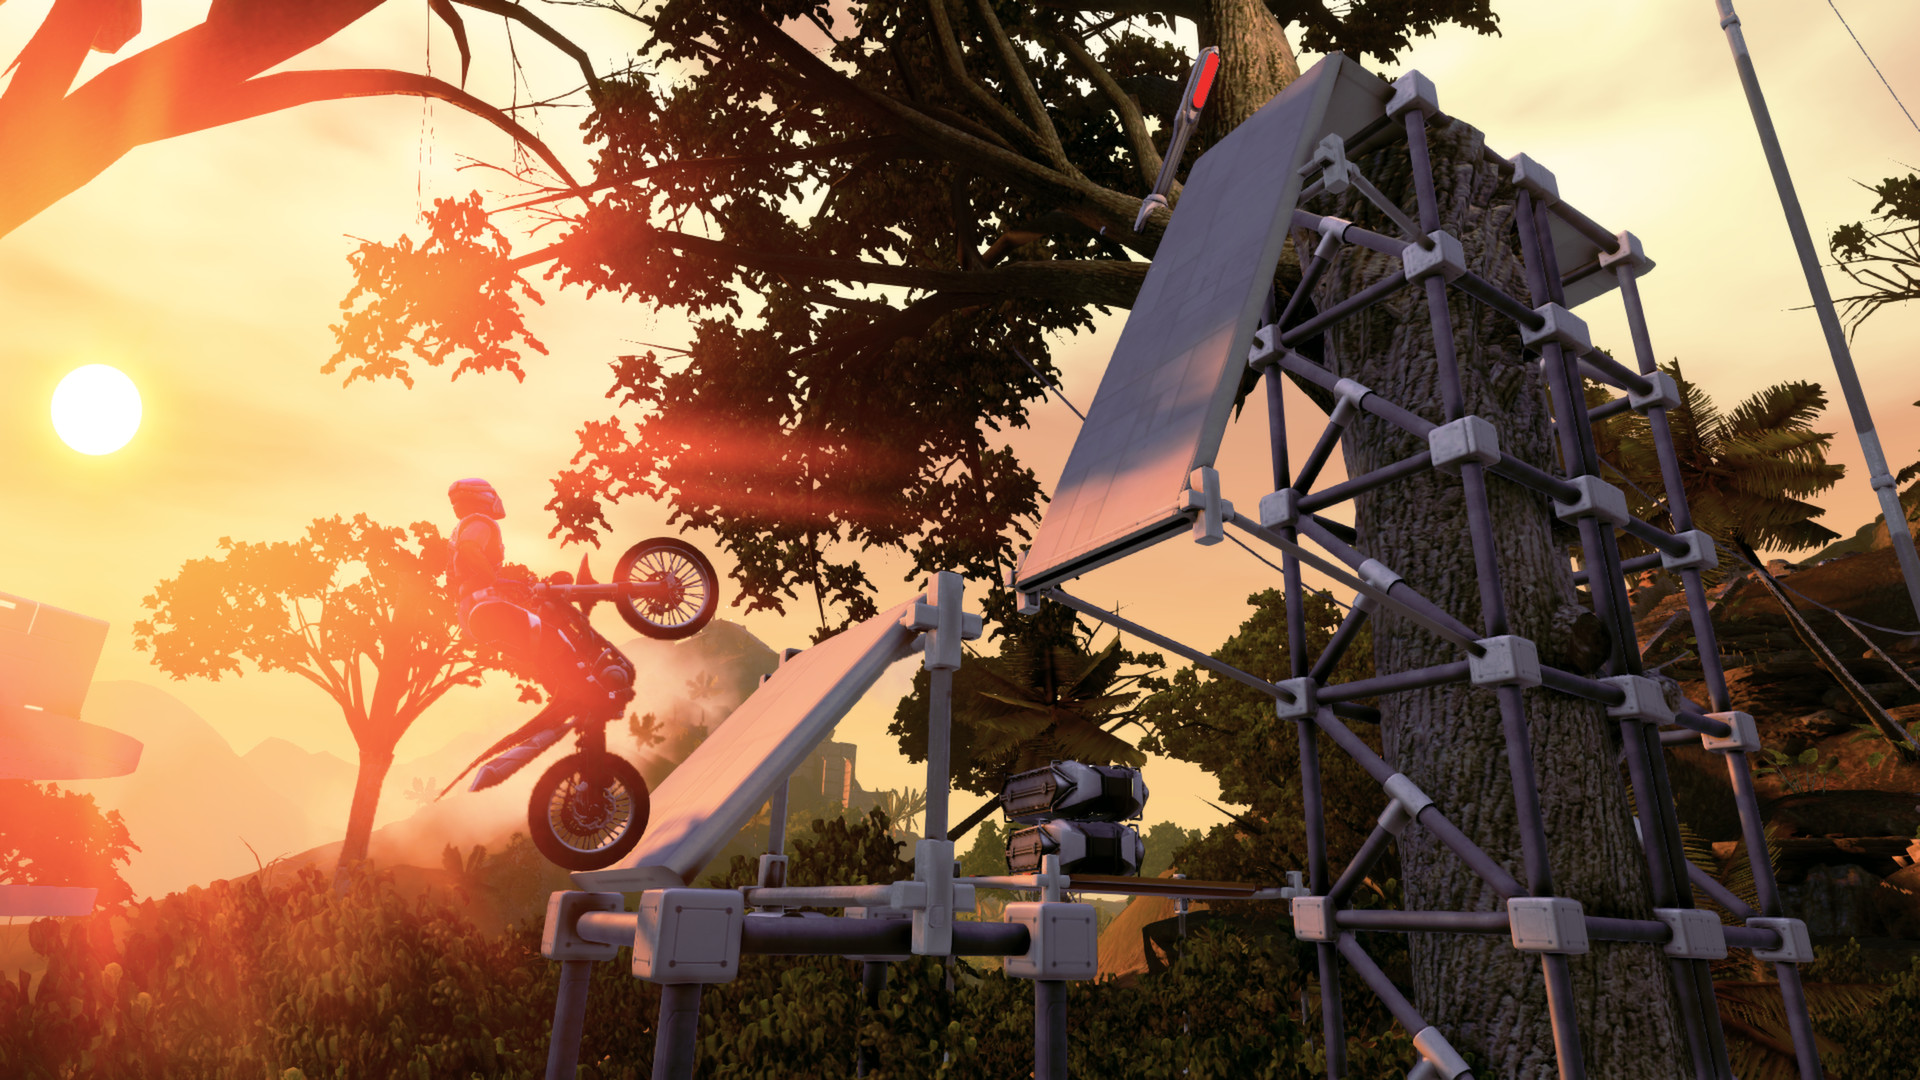 Trials Fusion image 3